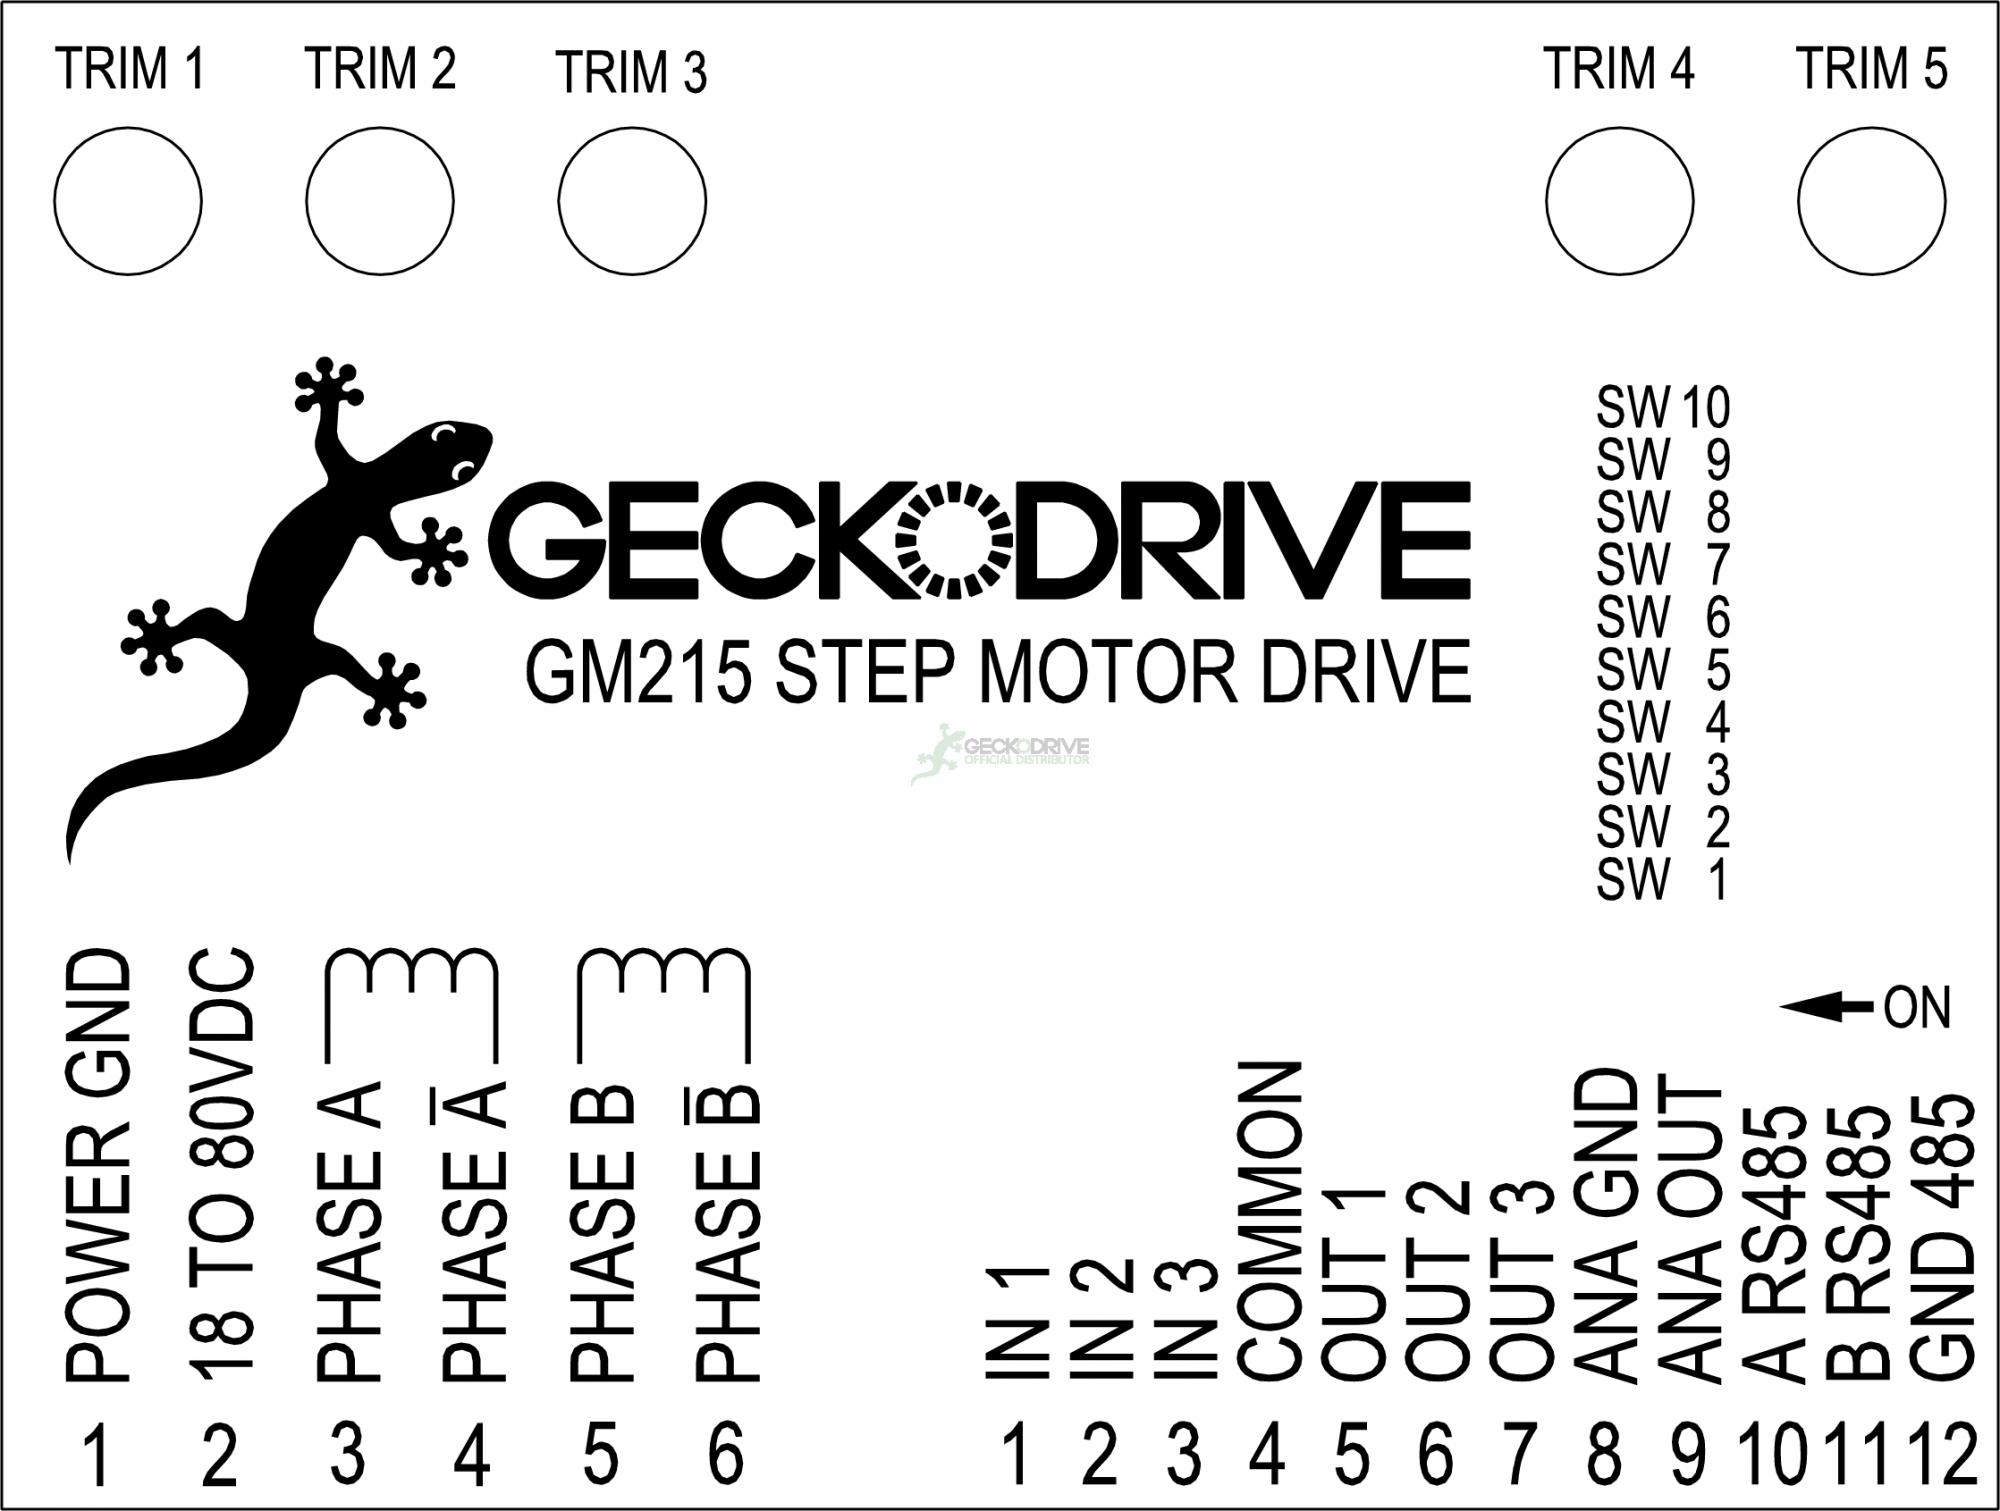 GM215 DRIVE